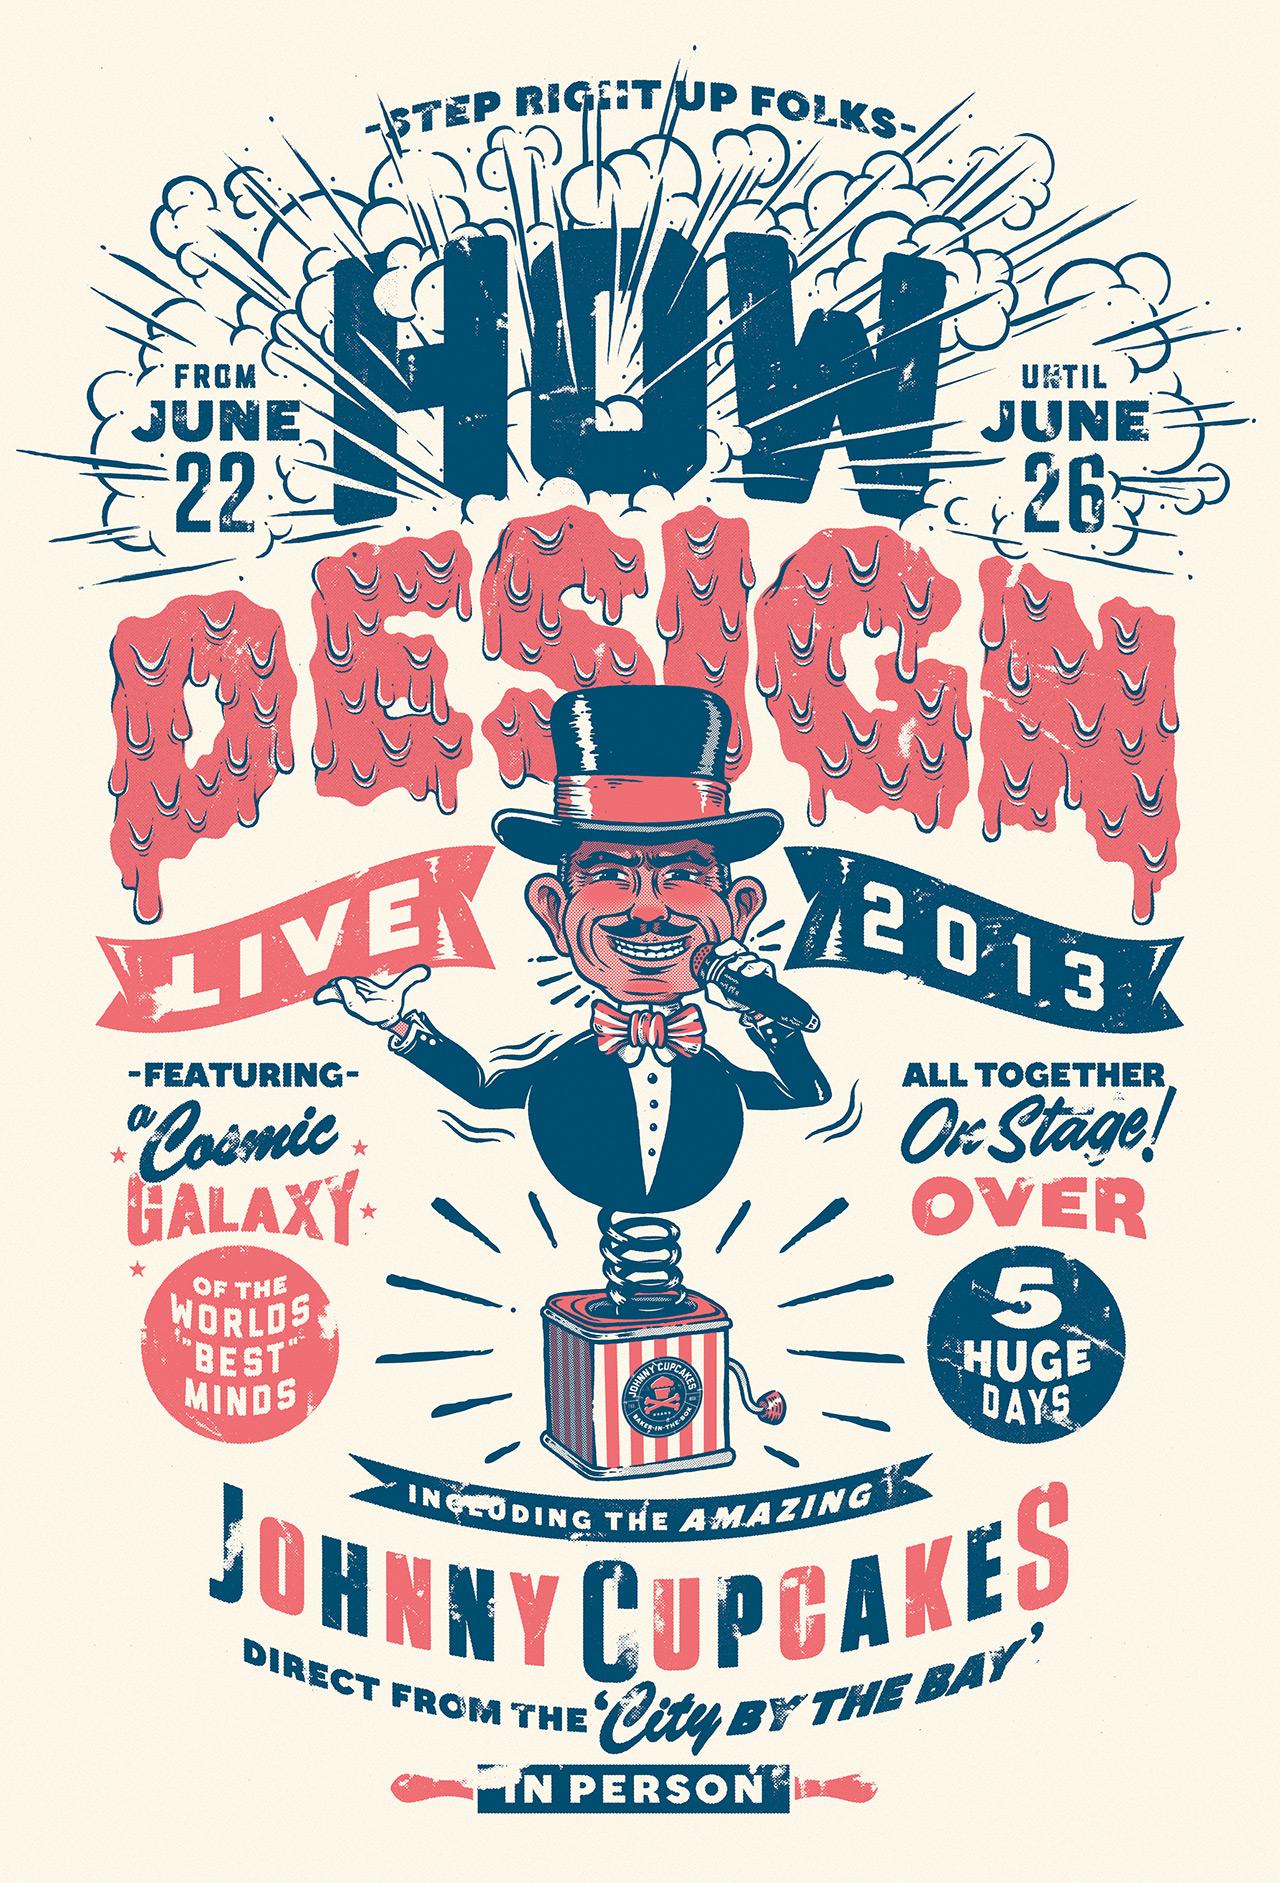 TS_JOHNNYCUPCAKES_How_Design_Live_72dpi.jpg